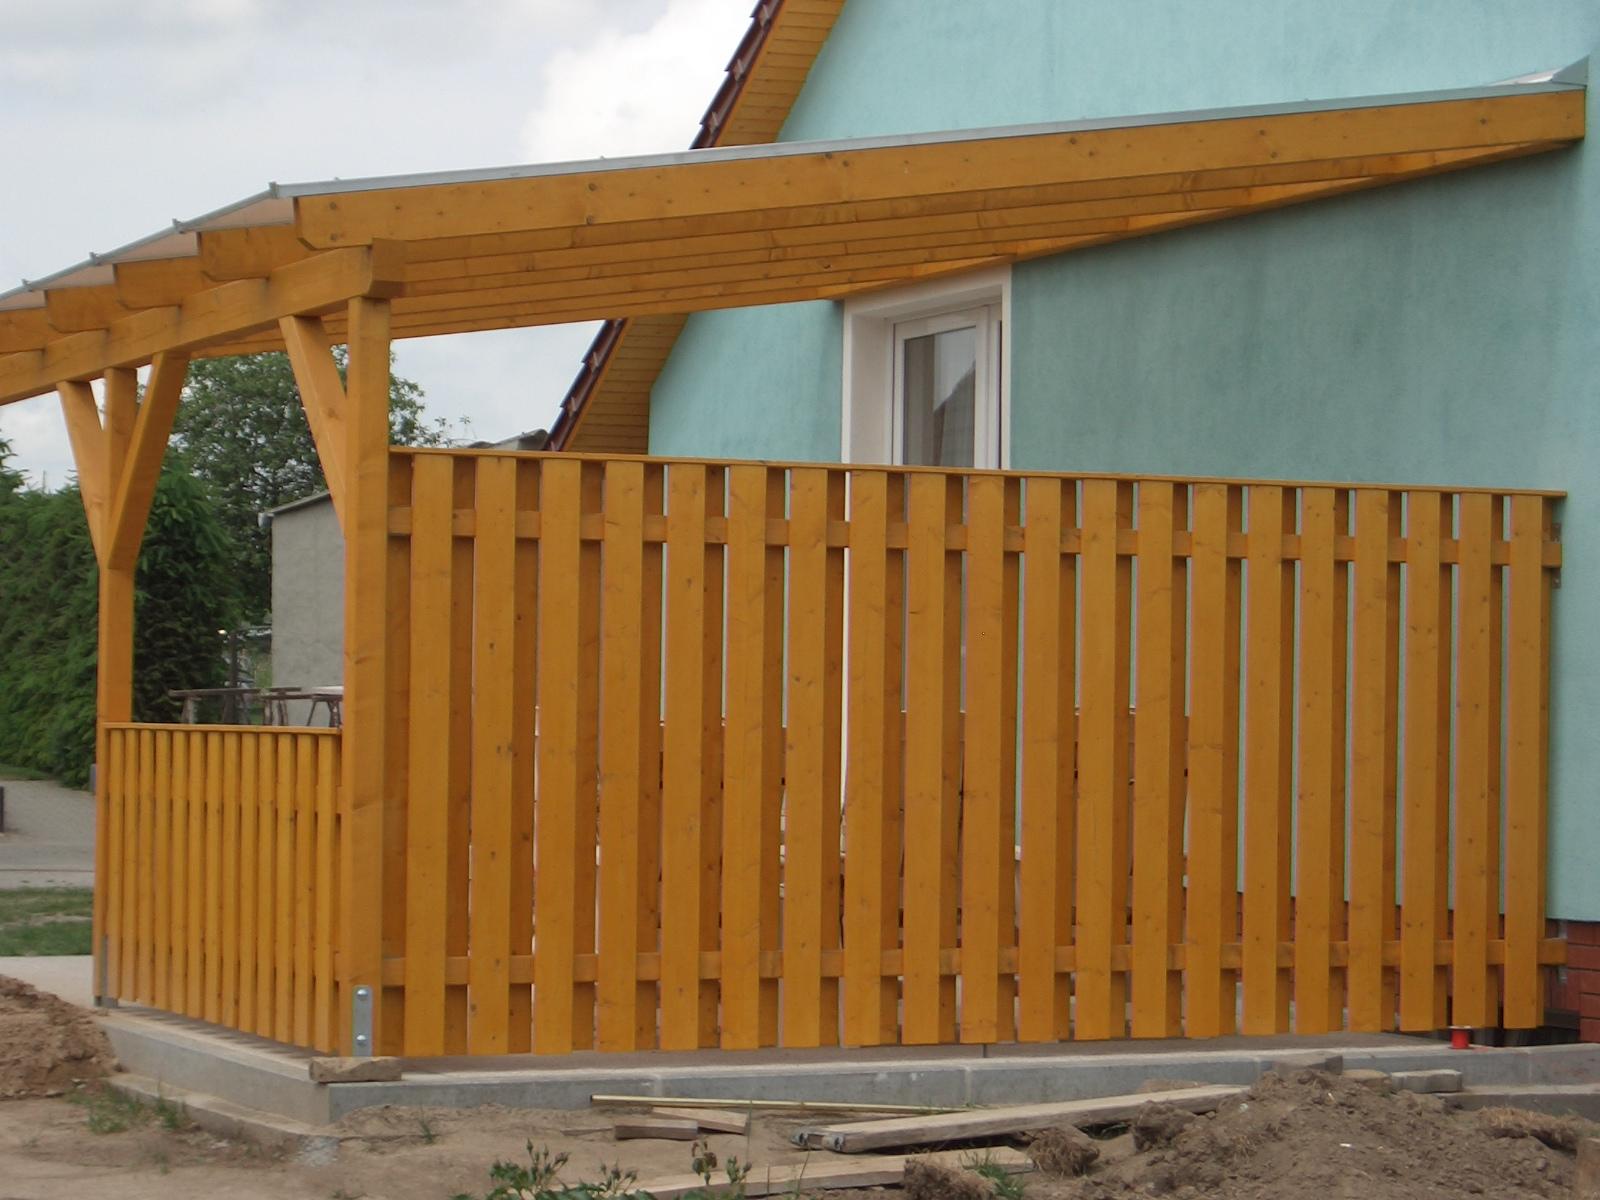 Terrassenuberdachung Satteldach Selber Bauen Carport Selber Bauen